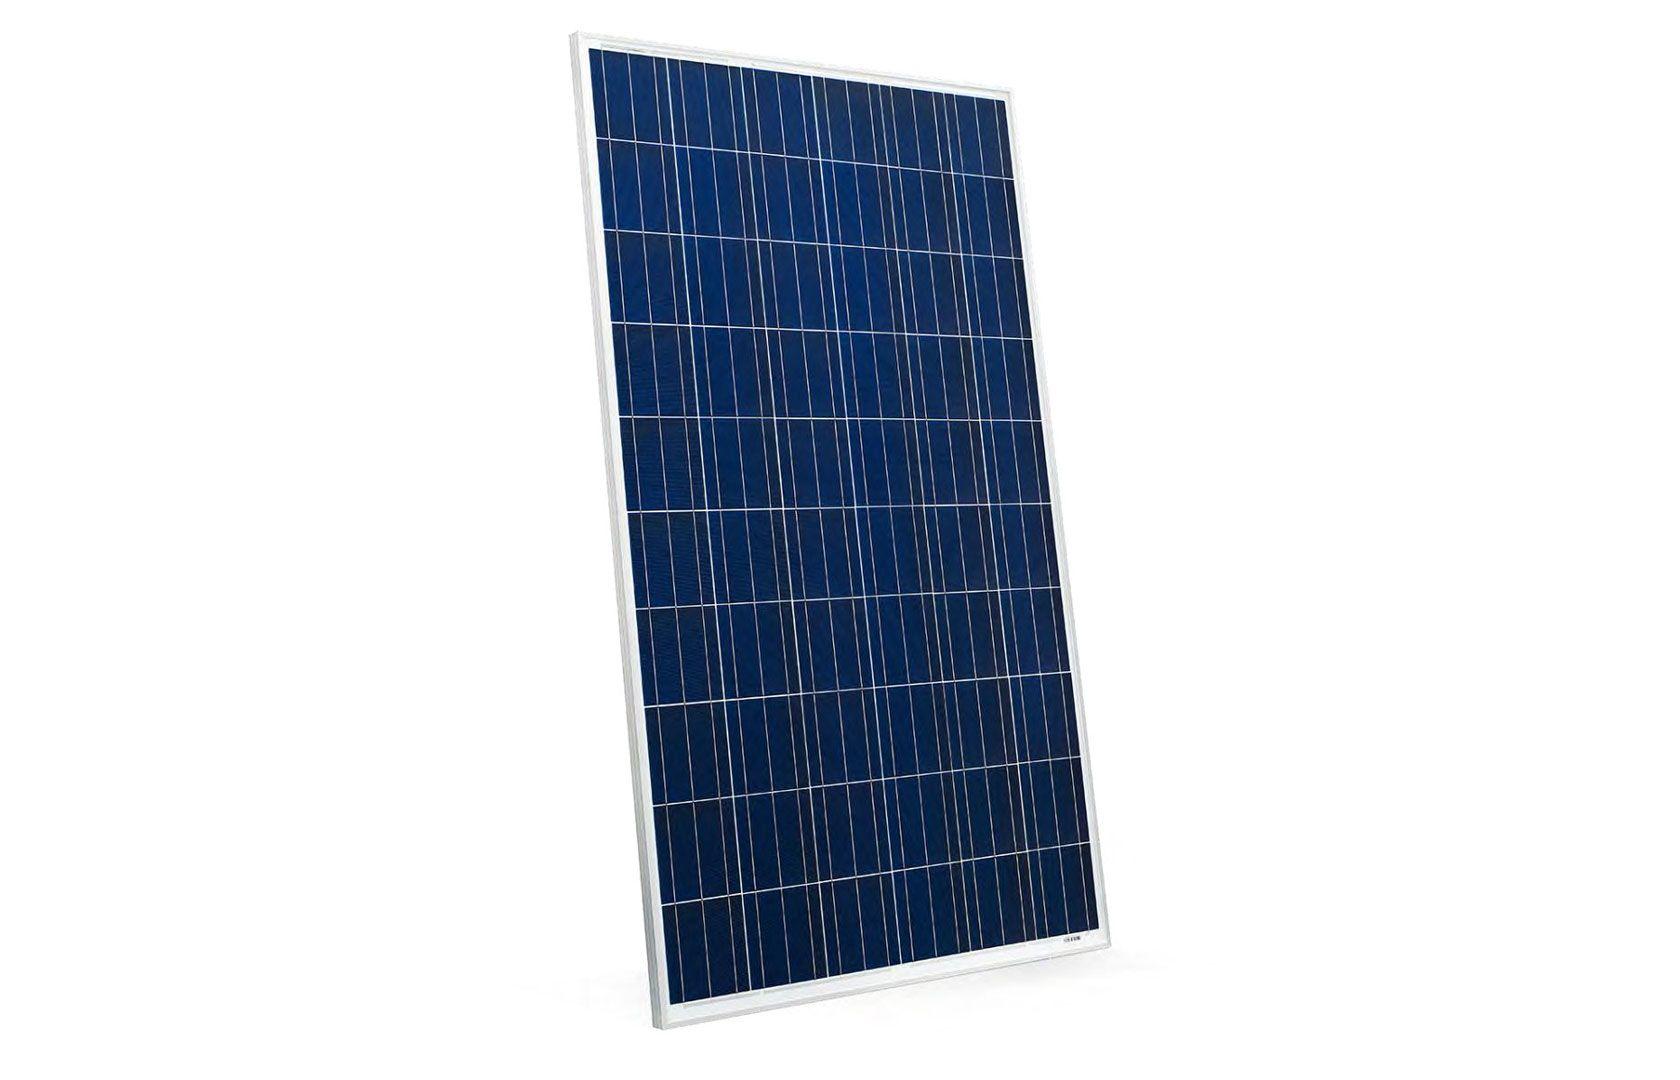 Adding Solar Panels To Your Home Solar Power House Solar Panel Installation Solar Energy System